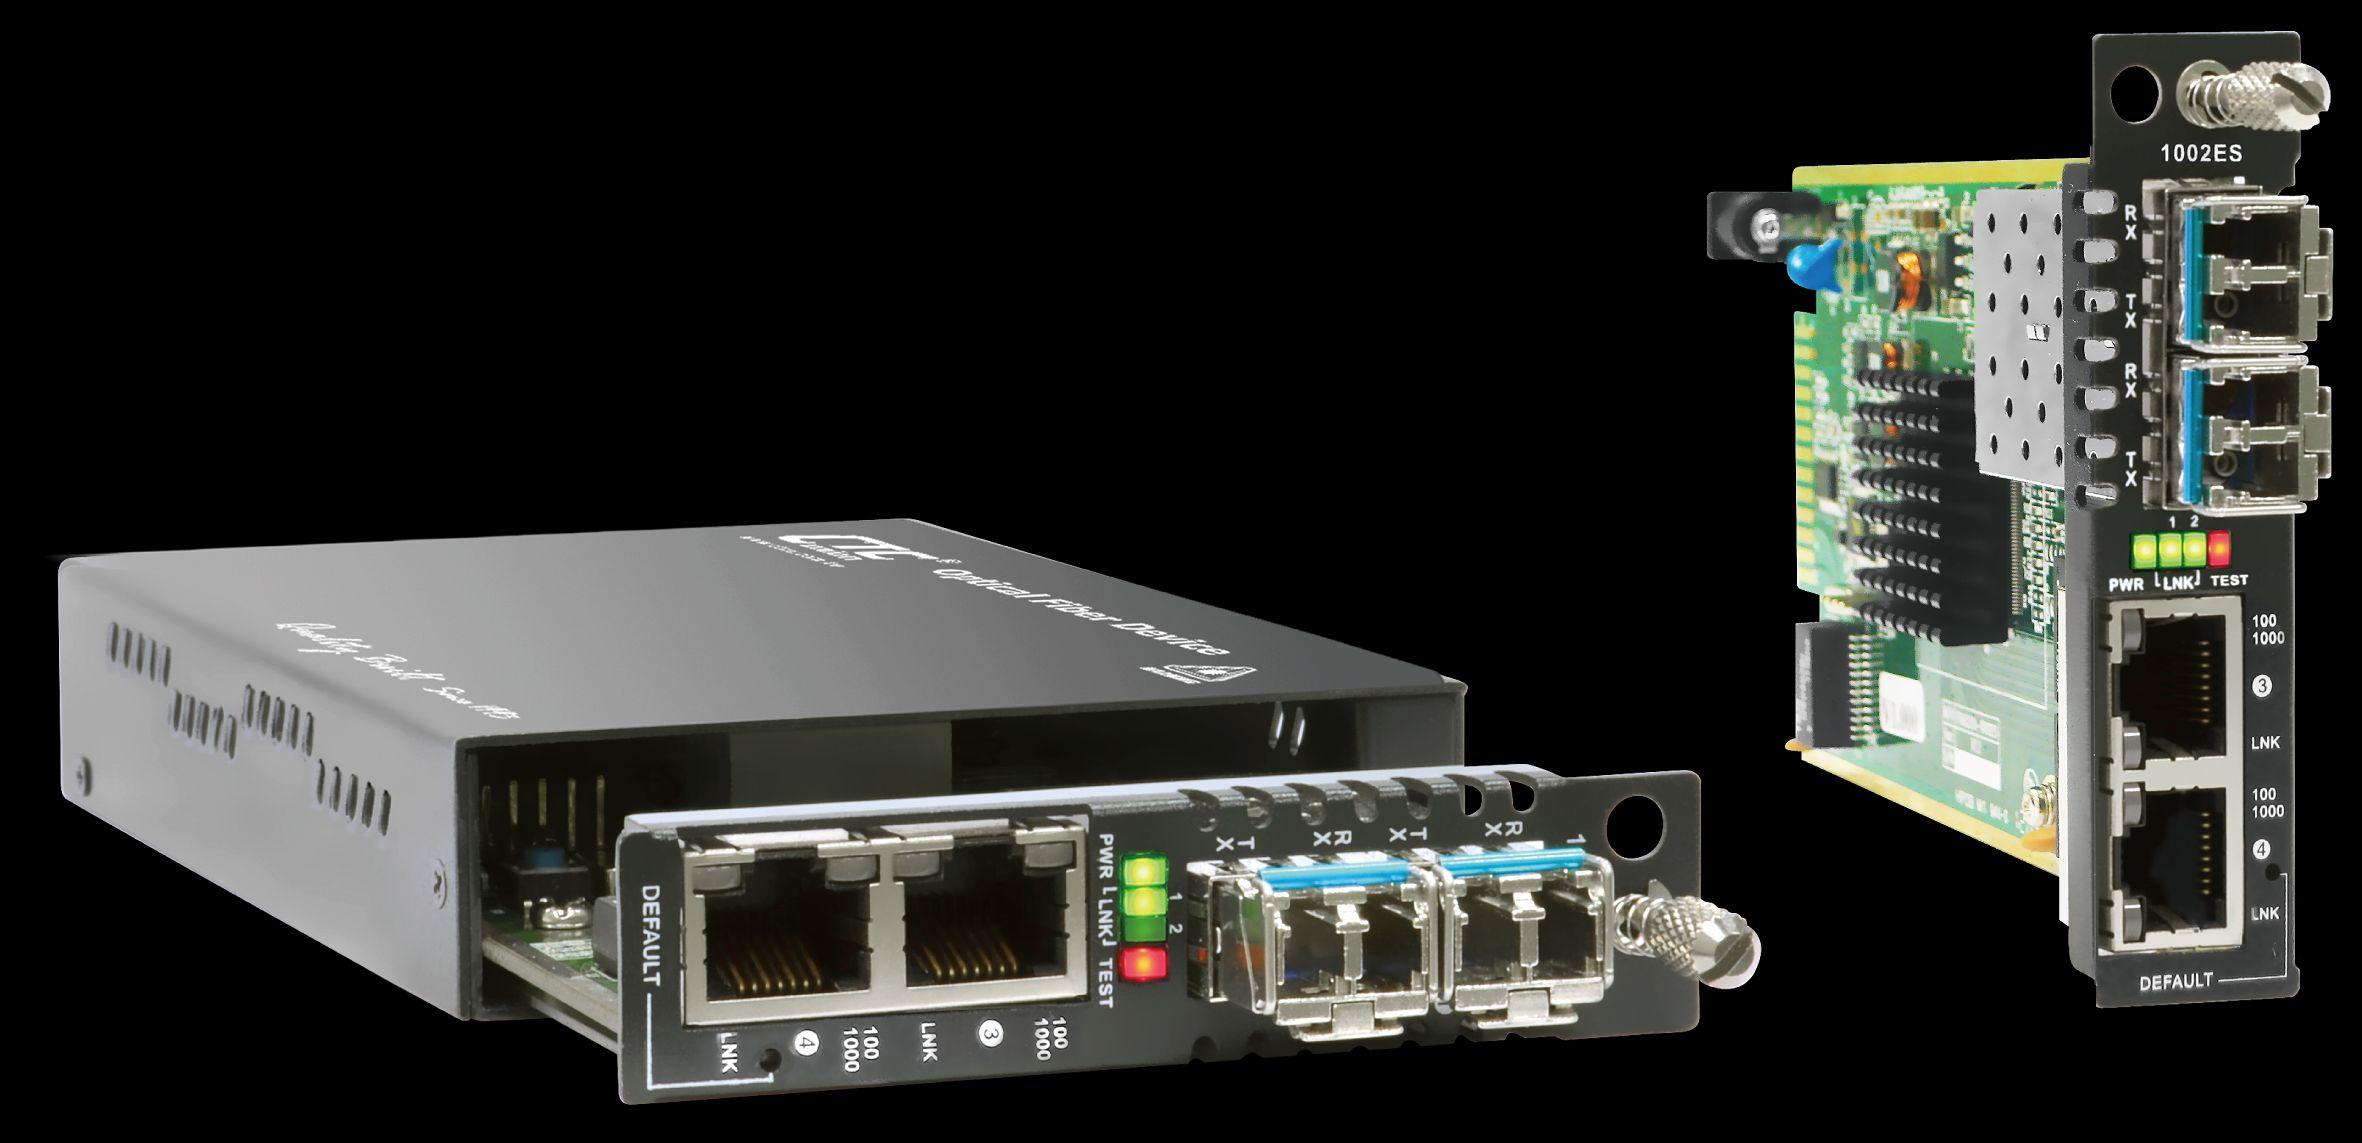 Card 2x 10/100/1000-T + 2x100/1000-X SFP GE switch   CTC UNION   FRM220A-1002ES